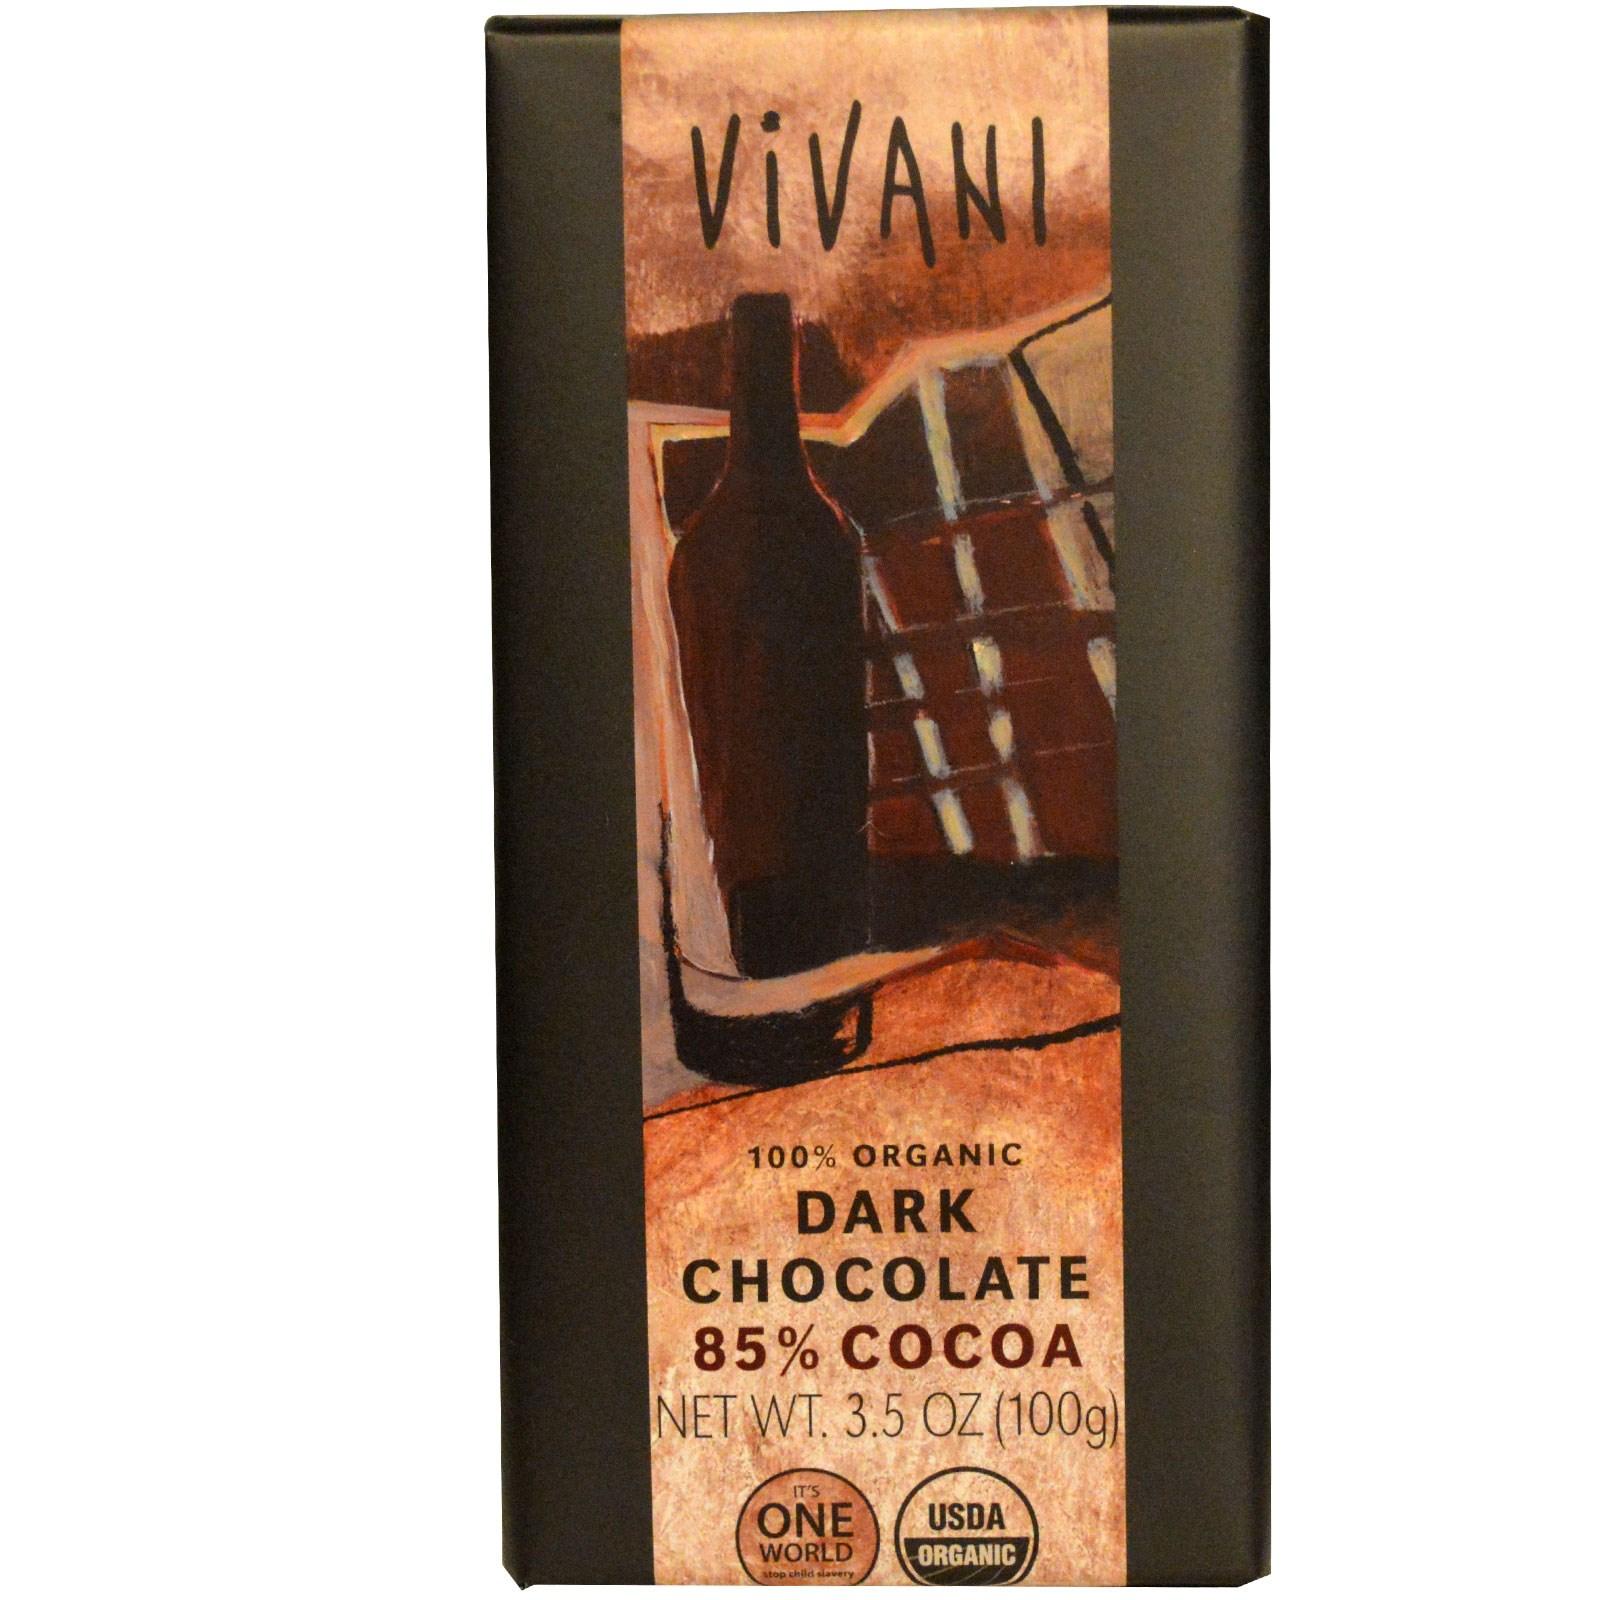 Vivani chokolade fra Mecindo